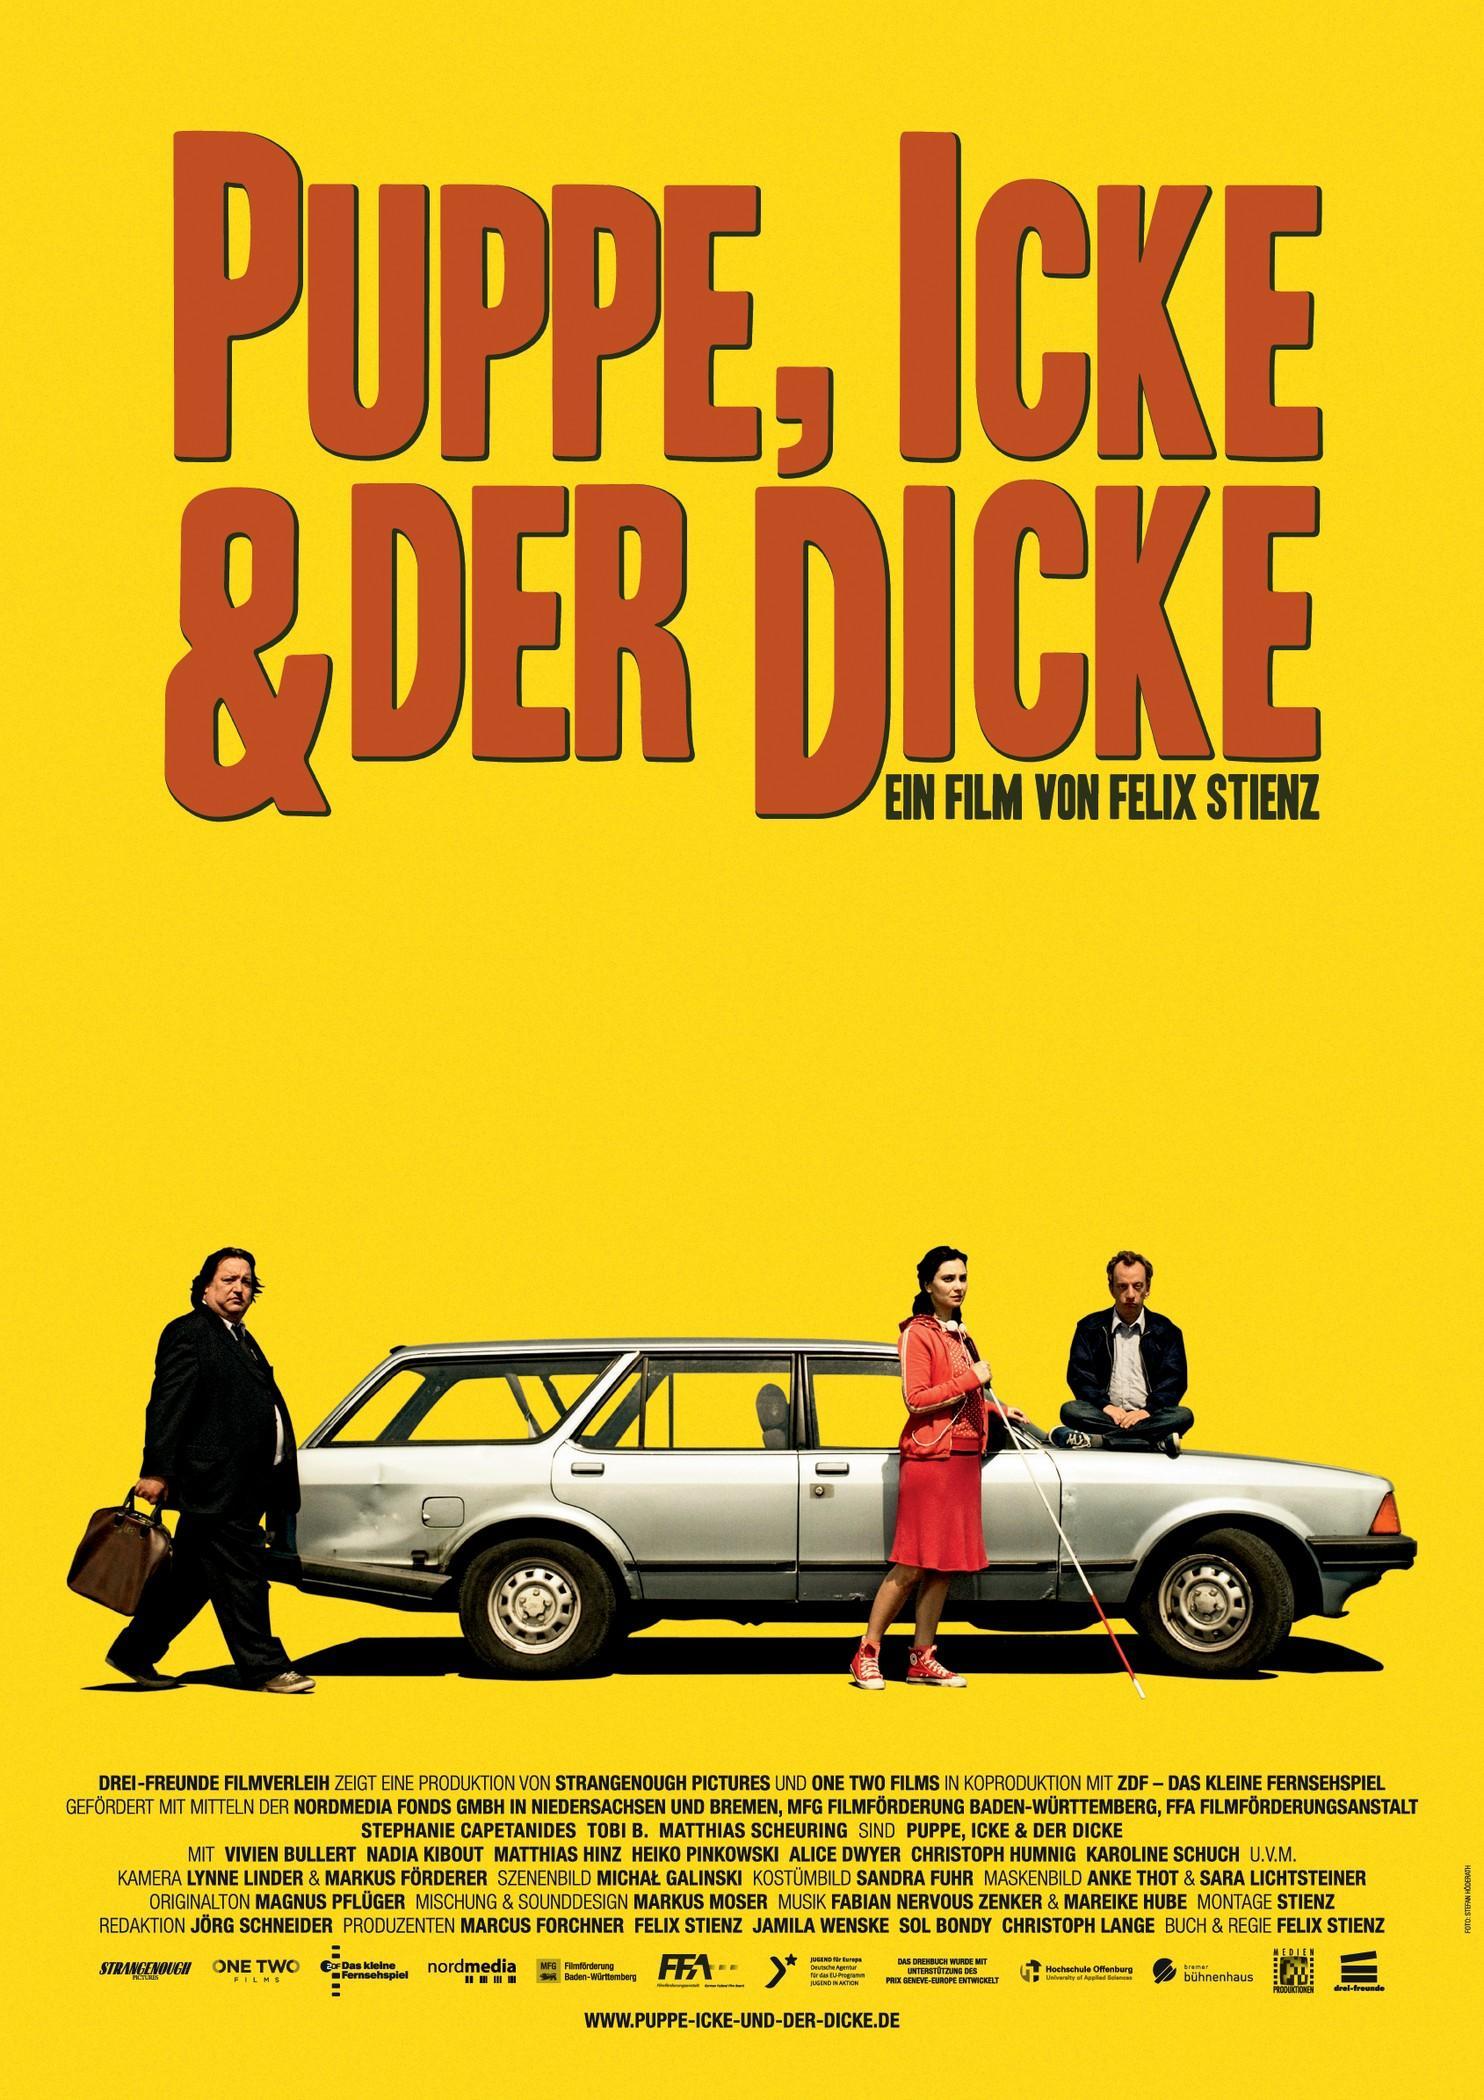 Puppe, Icke & der Dicke (Poster)